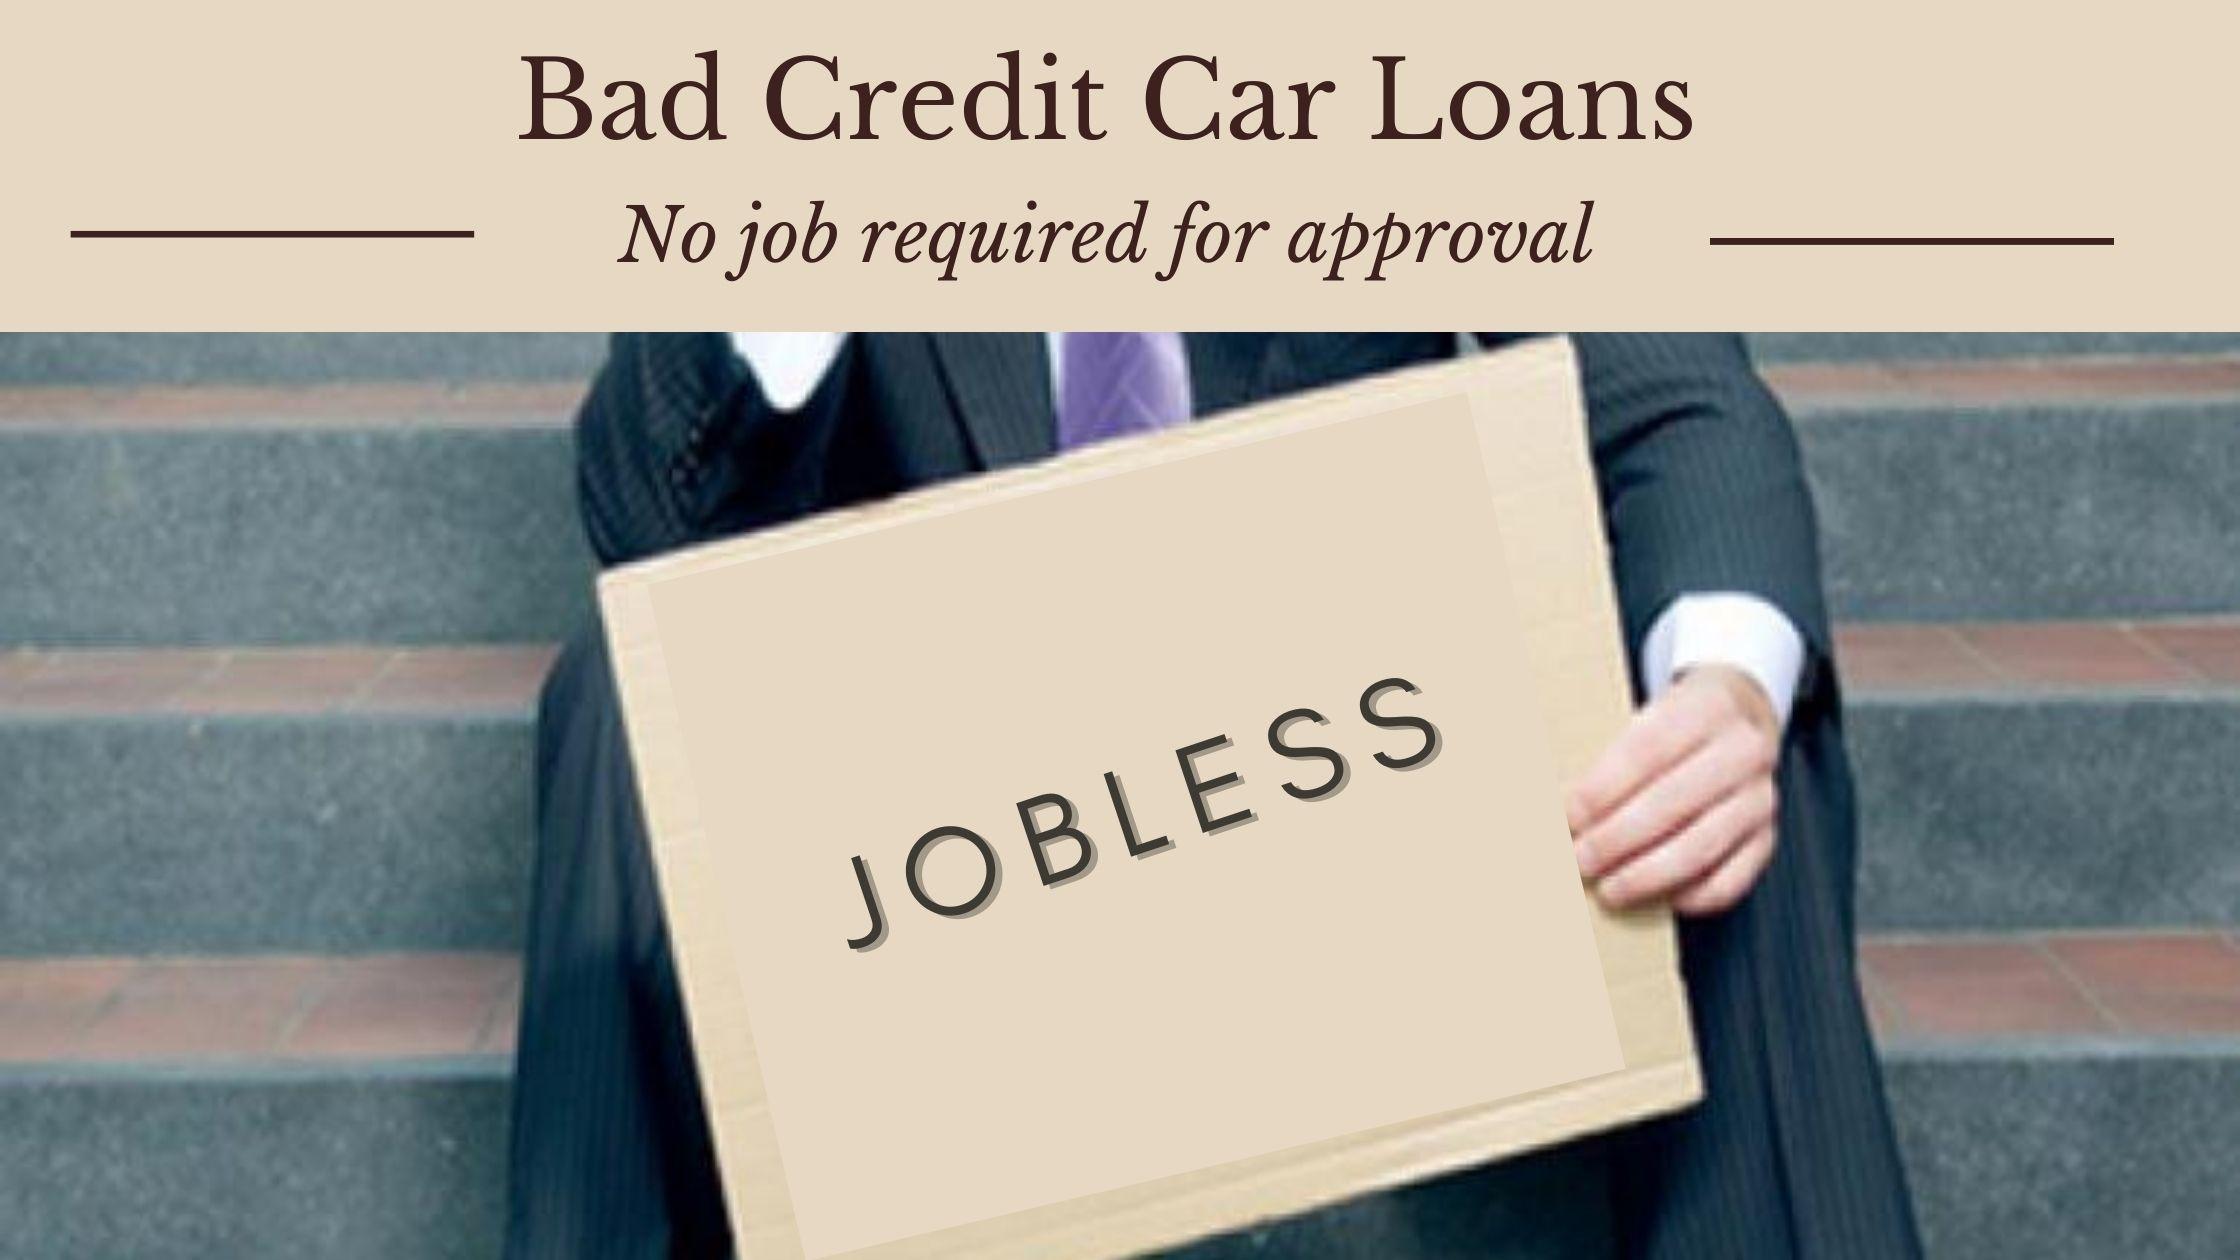 Get Hassle Free Bad Credit Car Loans Collateral Loans In 2020 Bad Credit Car Loan Car Loans Bad Credit